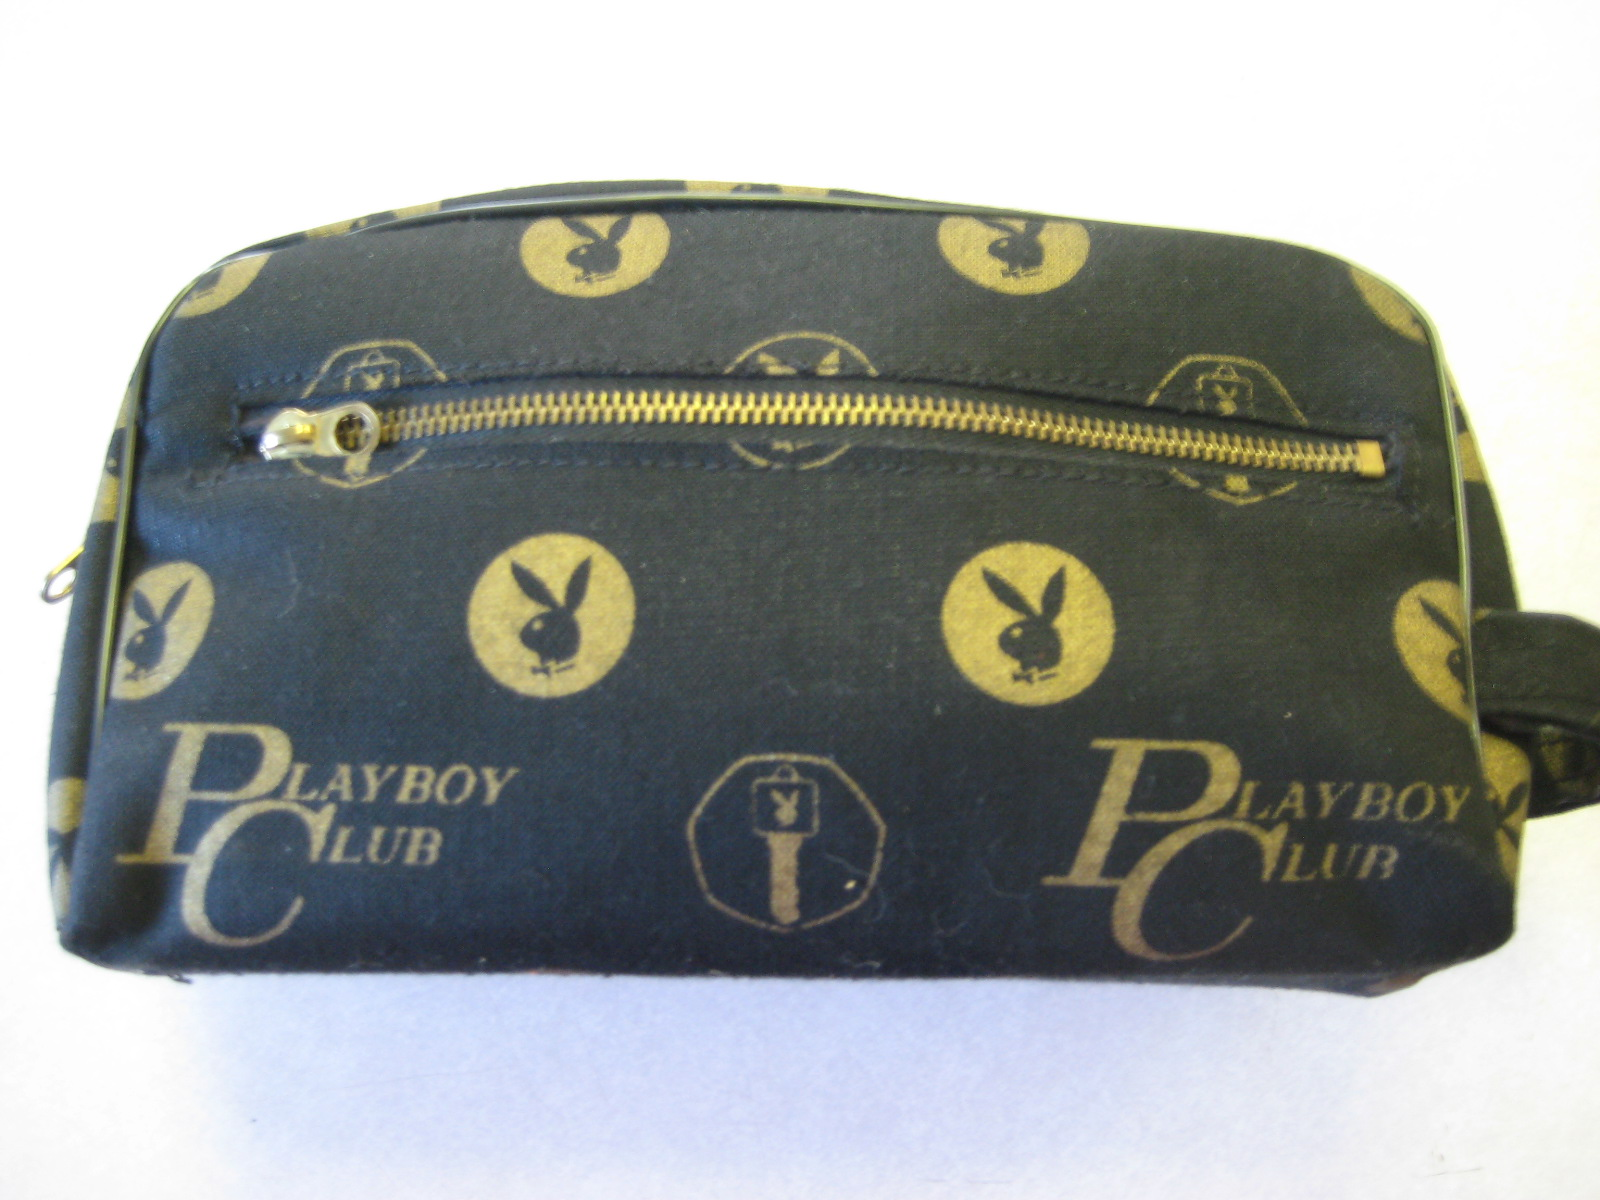 Playboy Club Men's Toiletries Bag